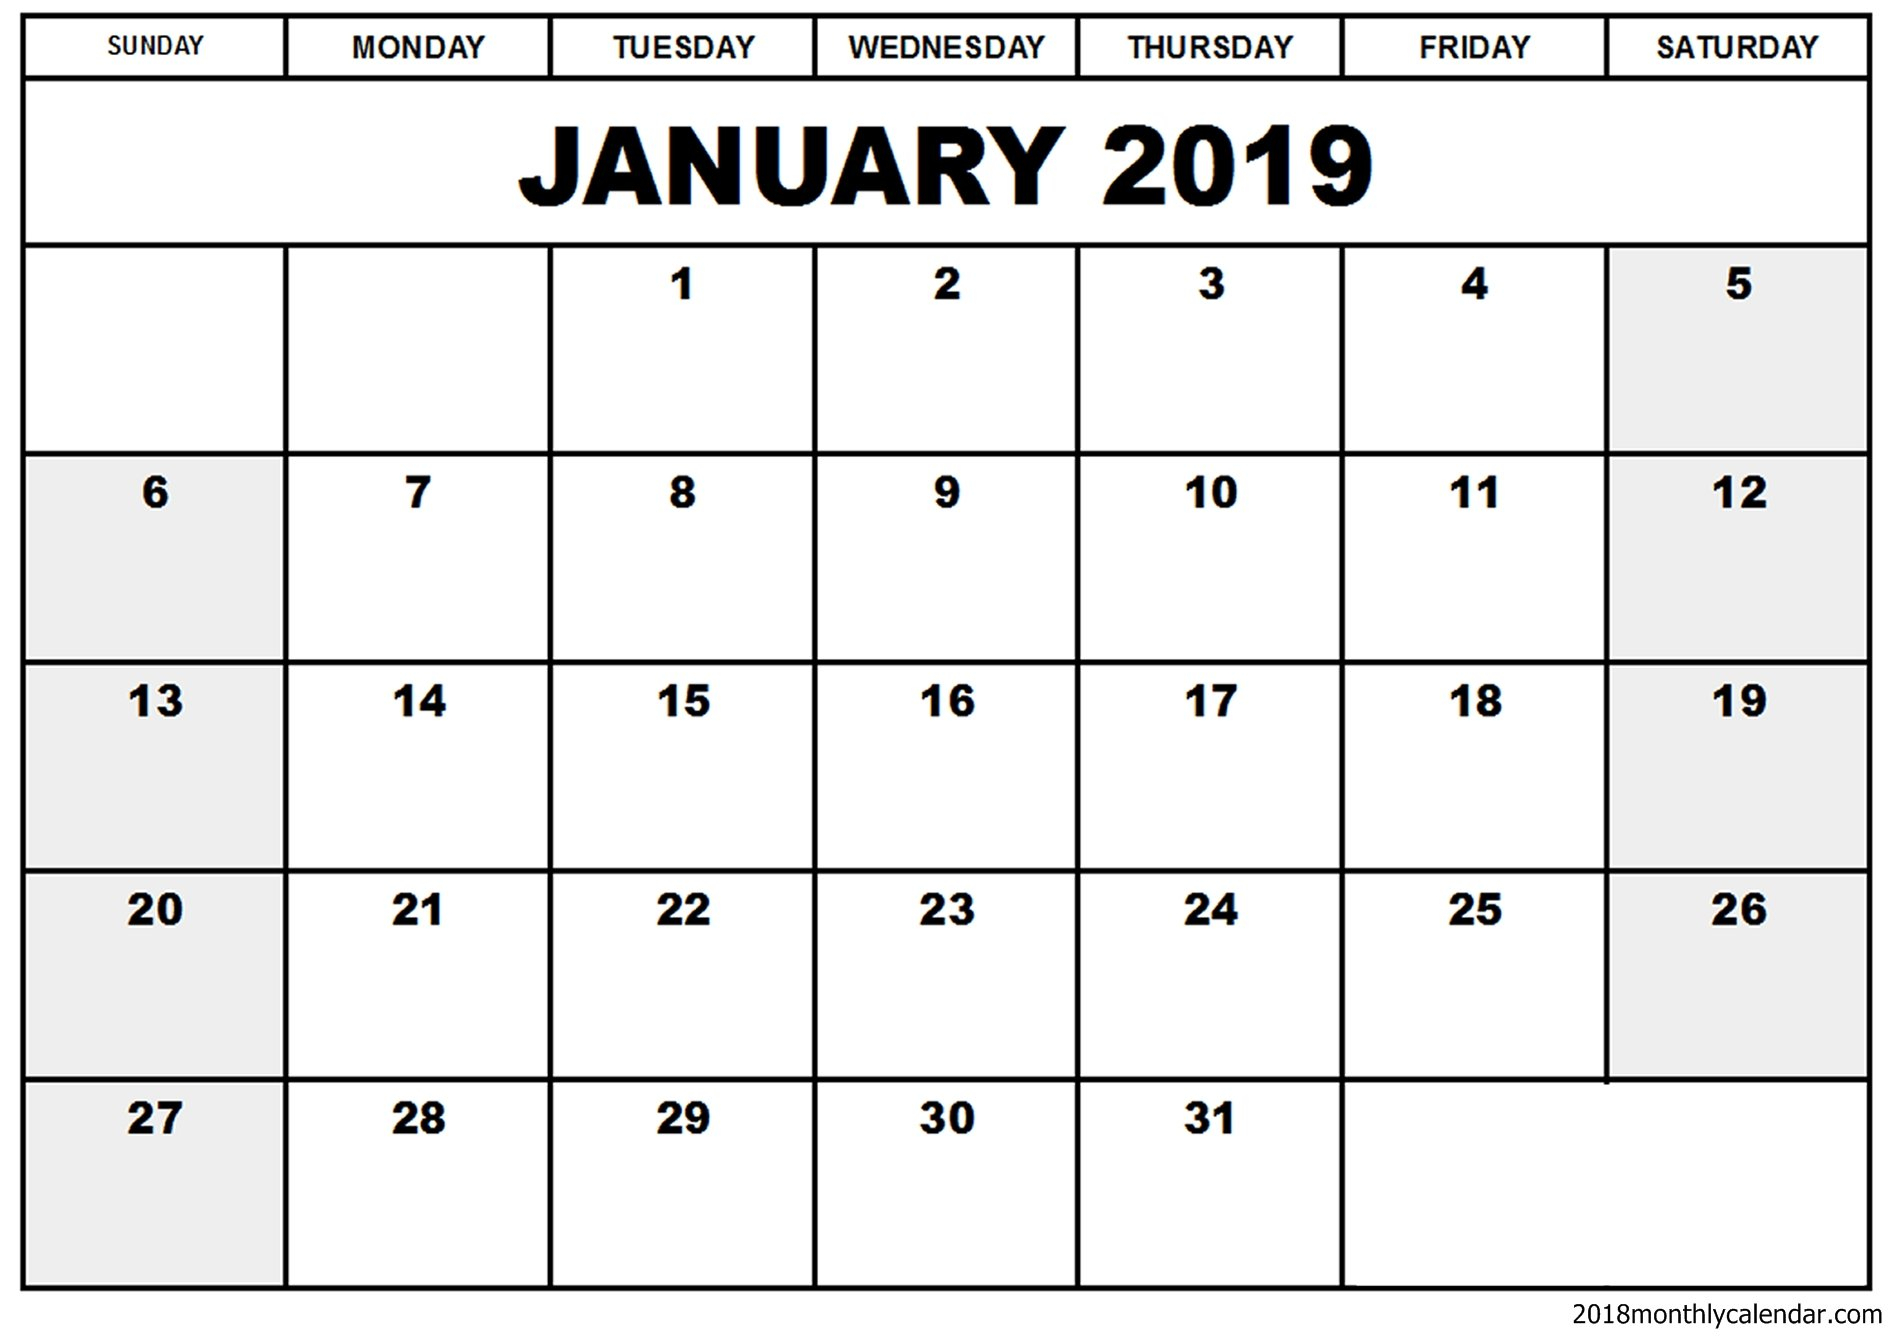 Download January 2019 Calendar – Blank & Editable Calendar 2019 Editable